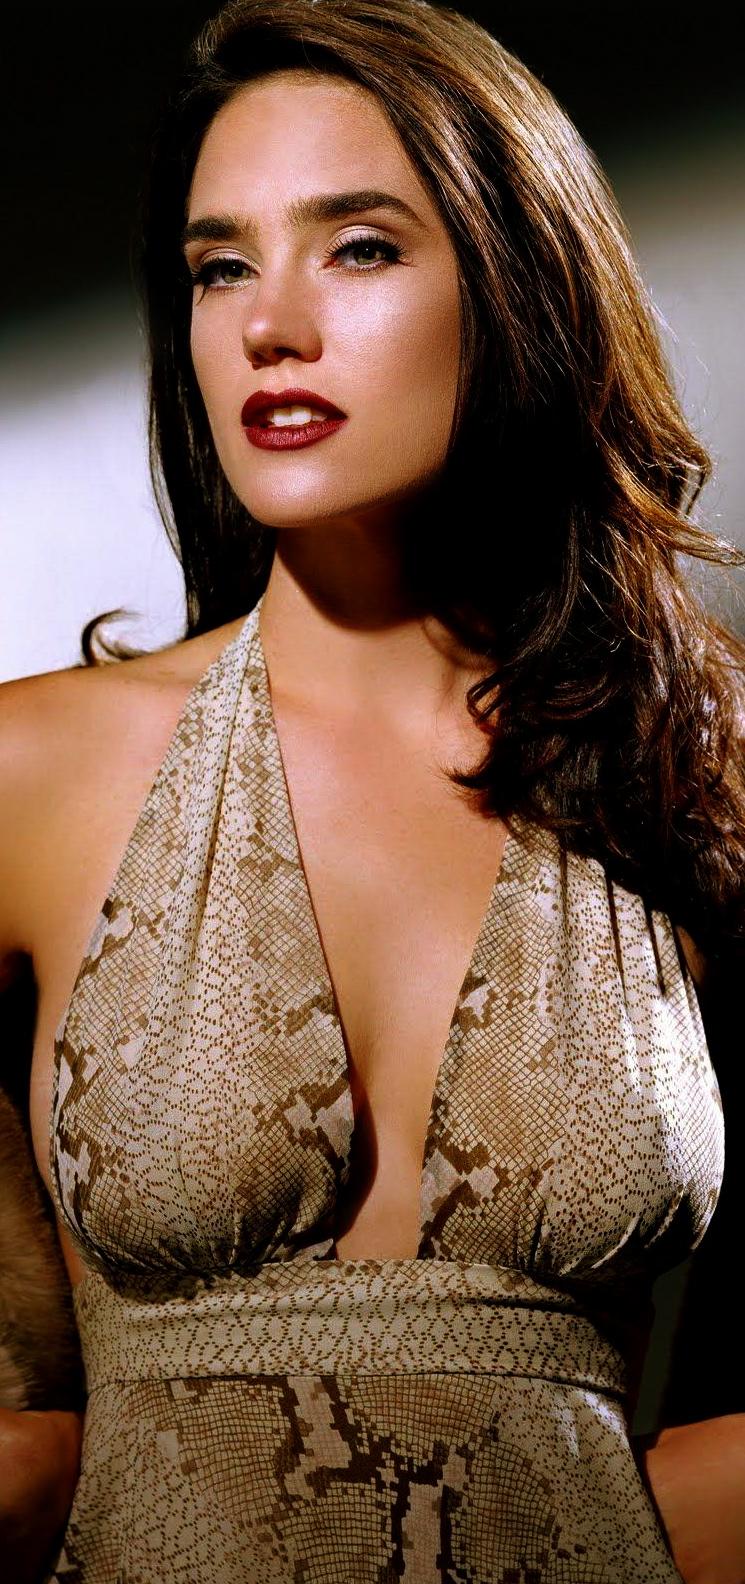 Stephanie birkitt nude Nude Photos 84